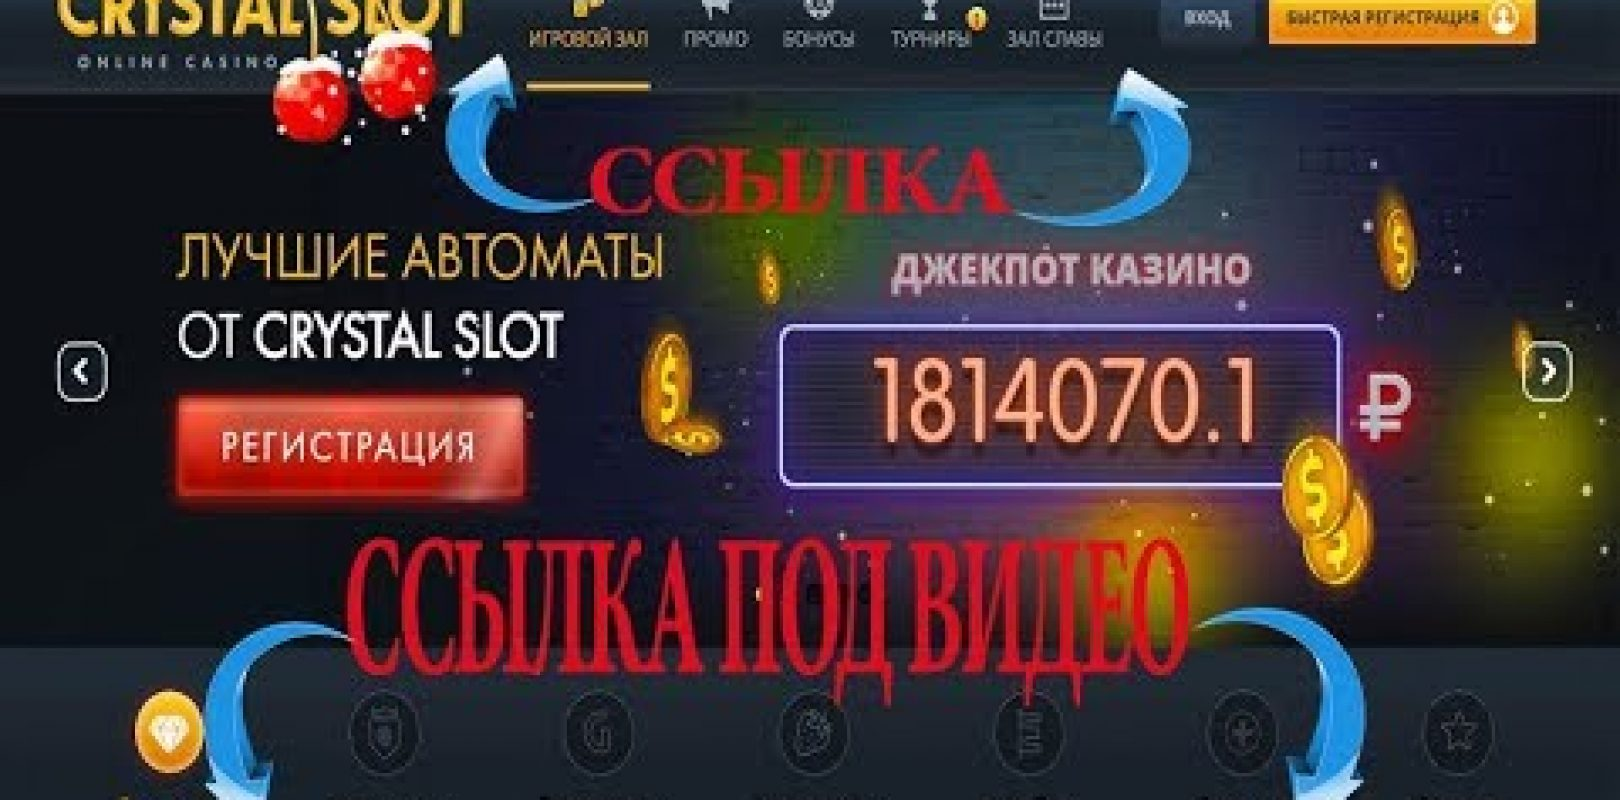 Голден геймес азартные игры слоты